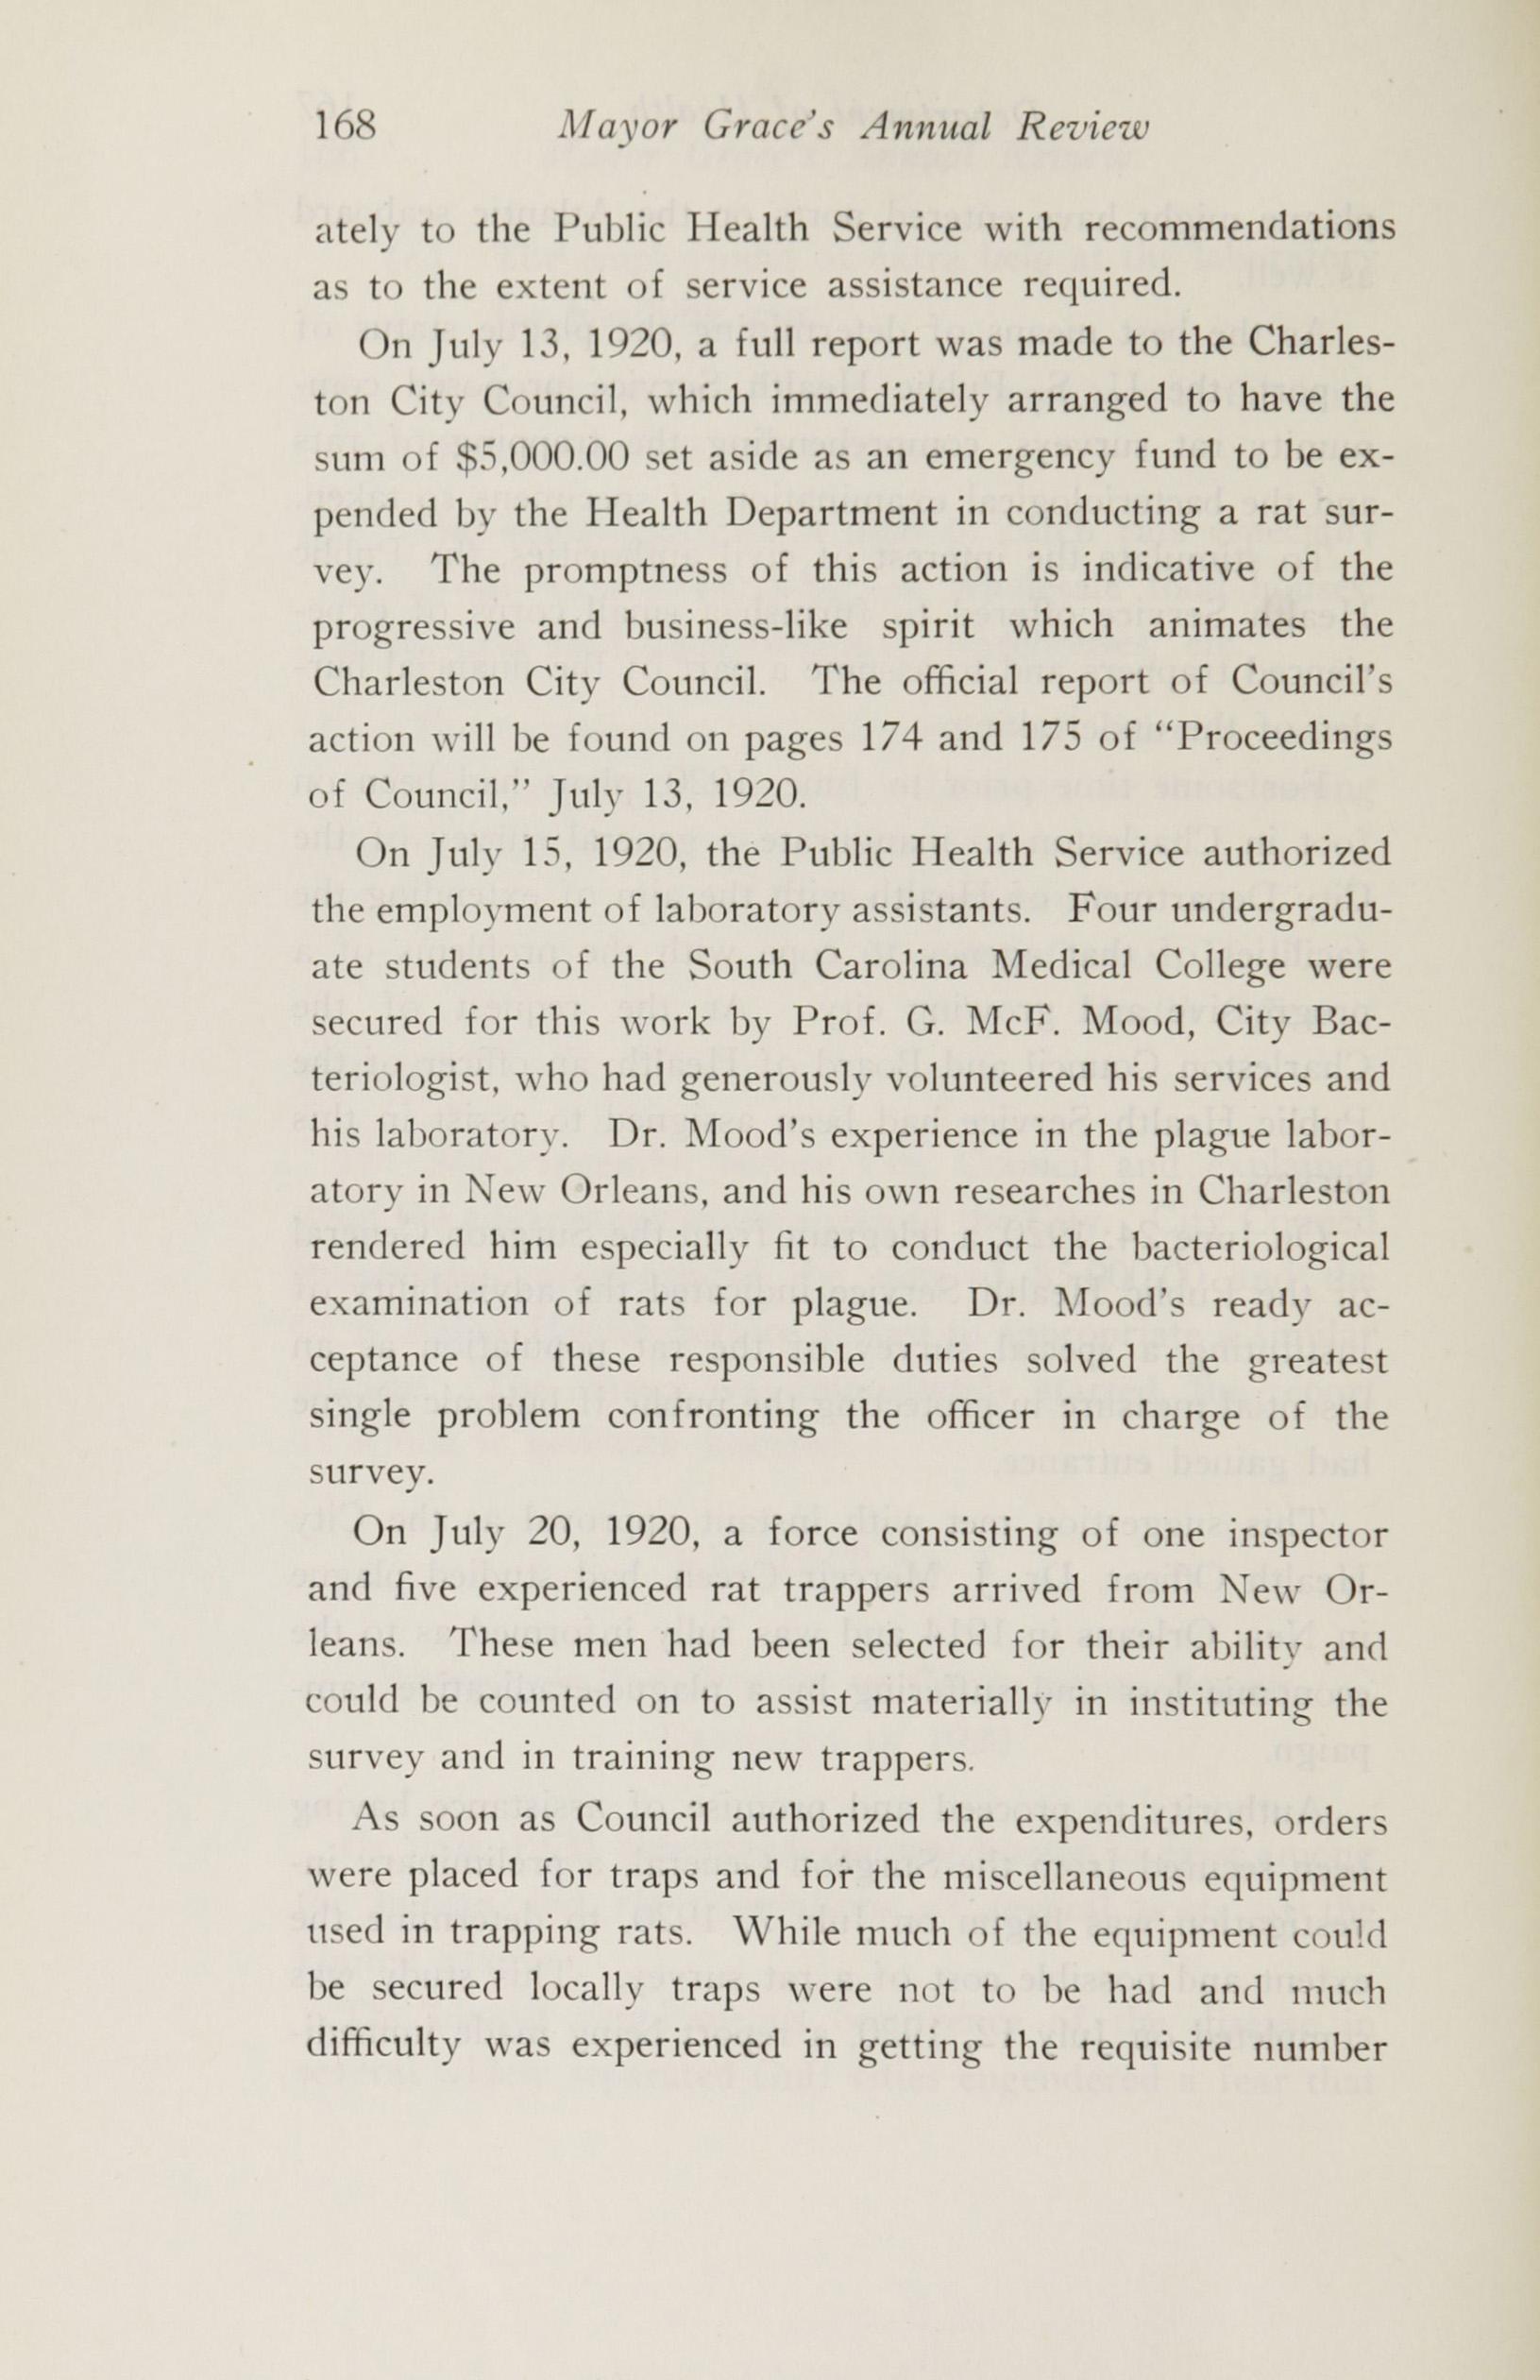 Charleston Yearbook, 1920, page 168